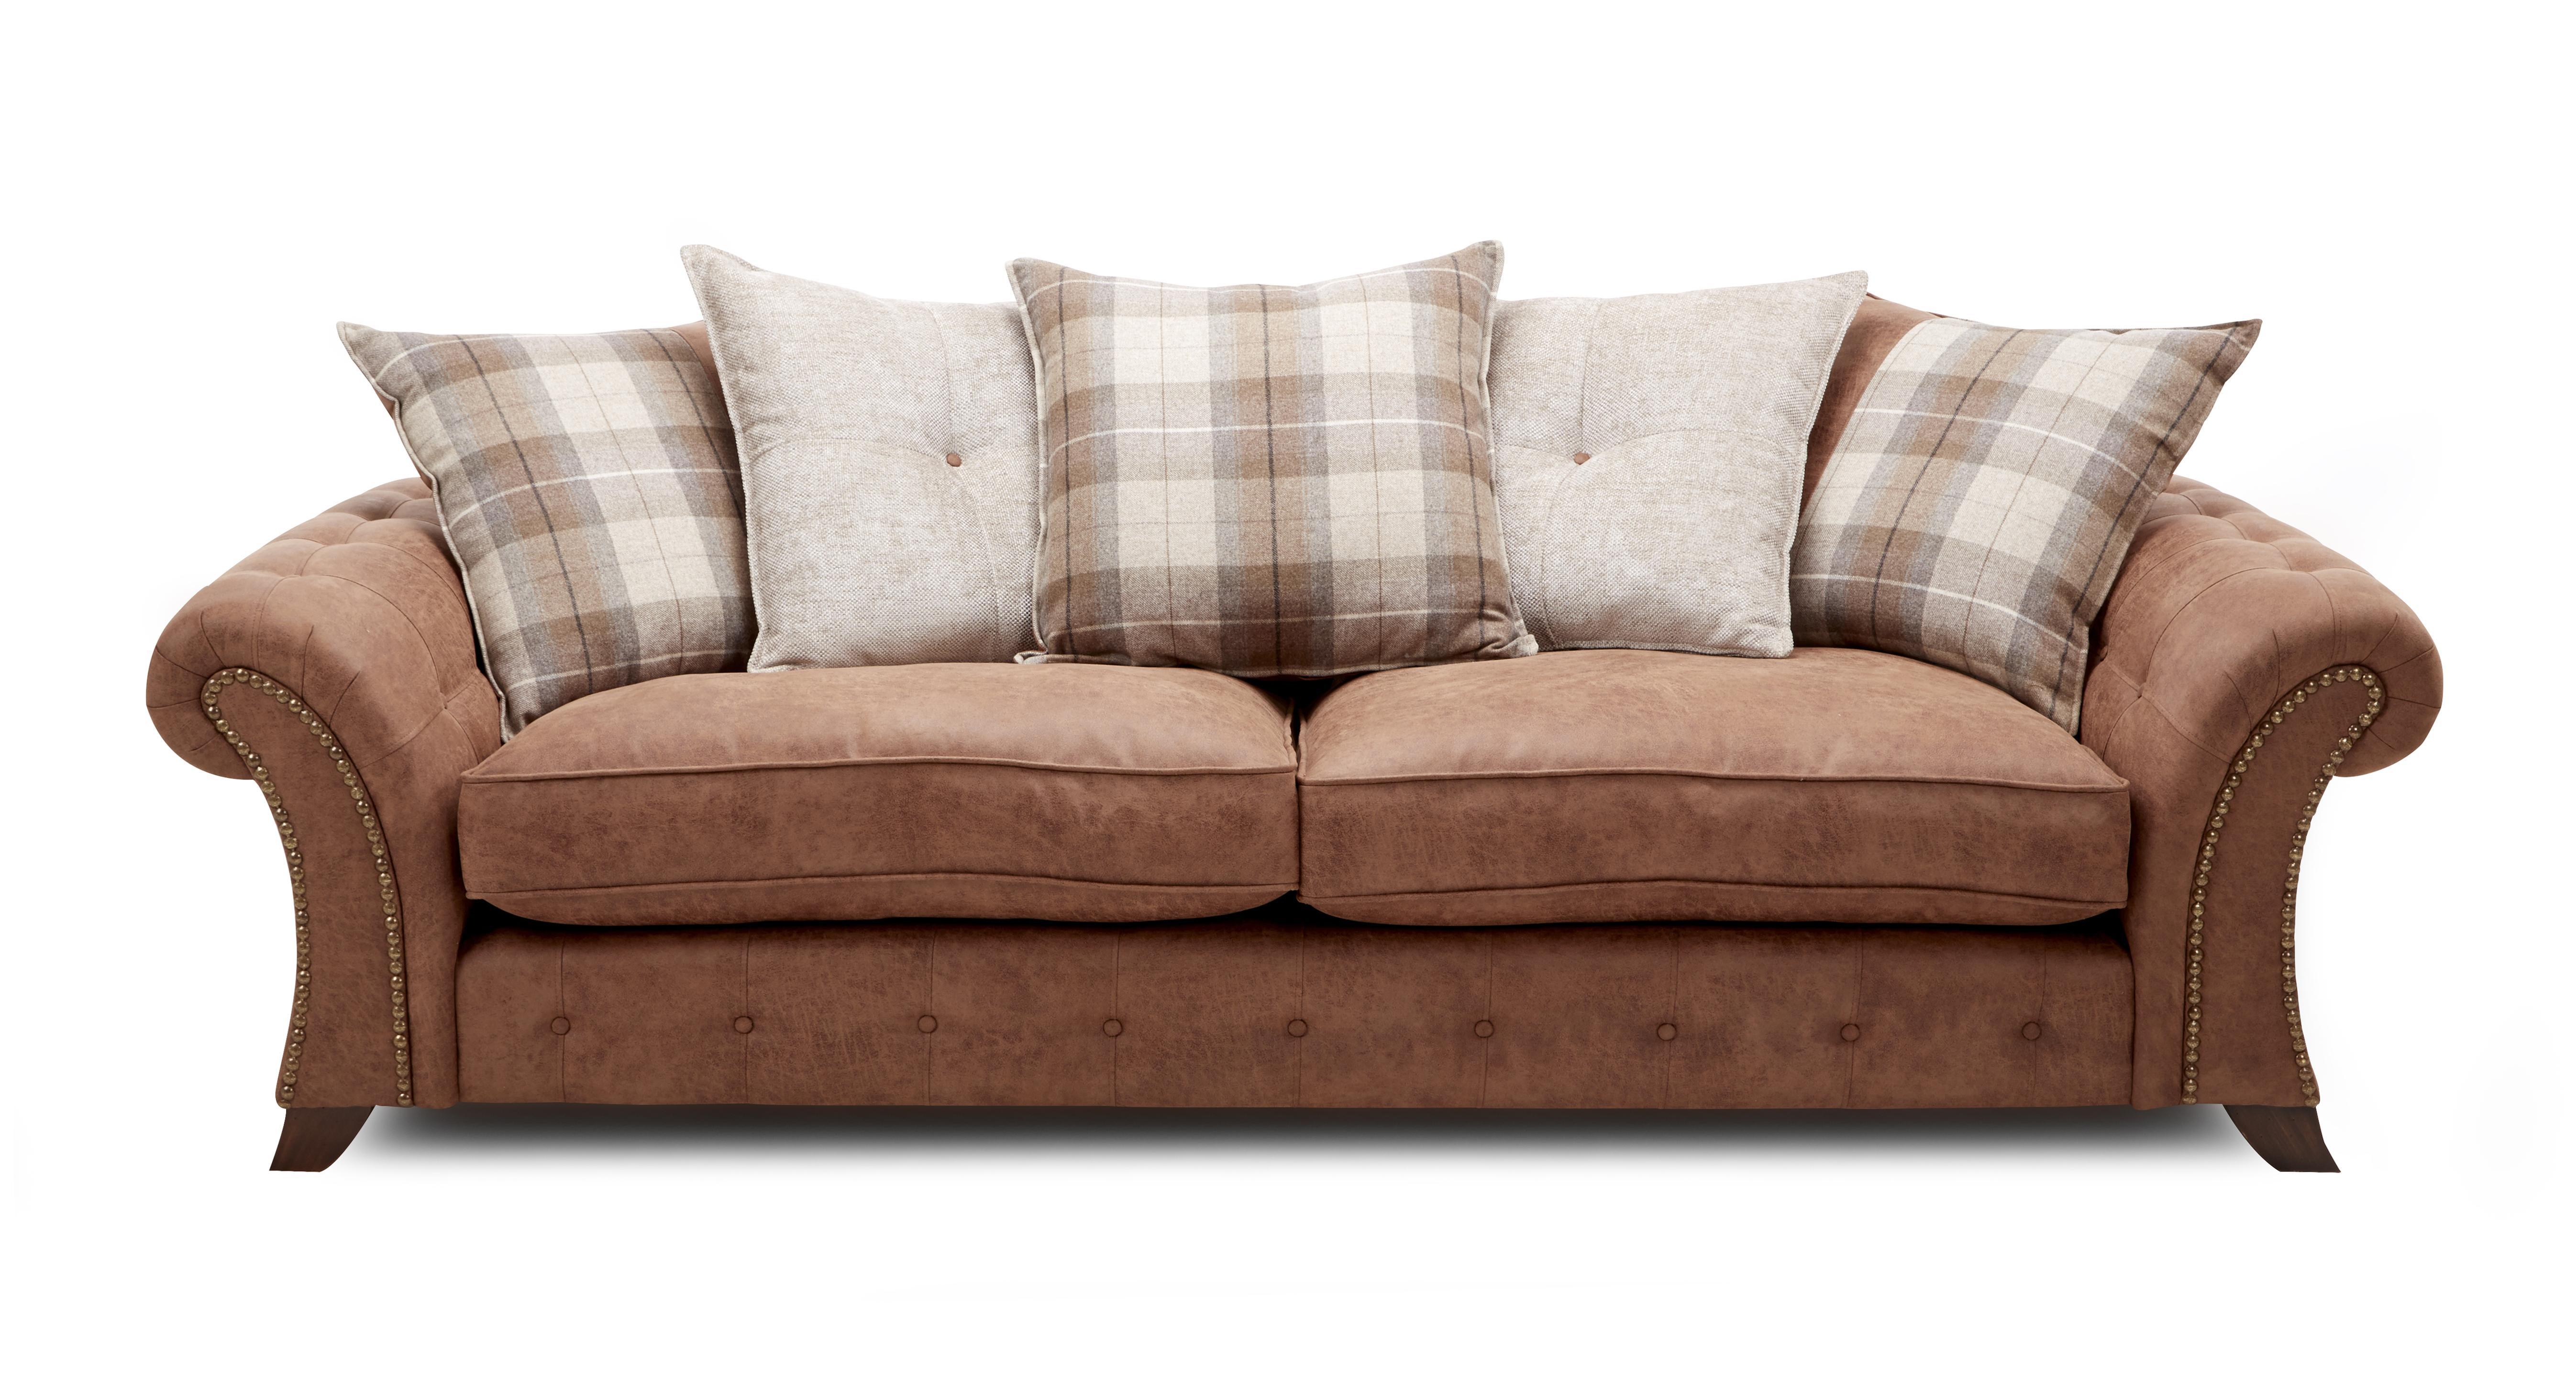 Woodland Express 4 Seater Pillow Back Sofa Oakland | DFS